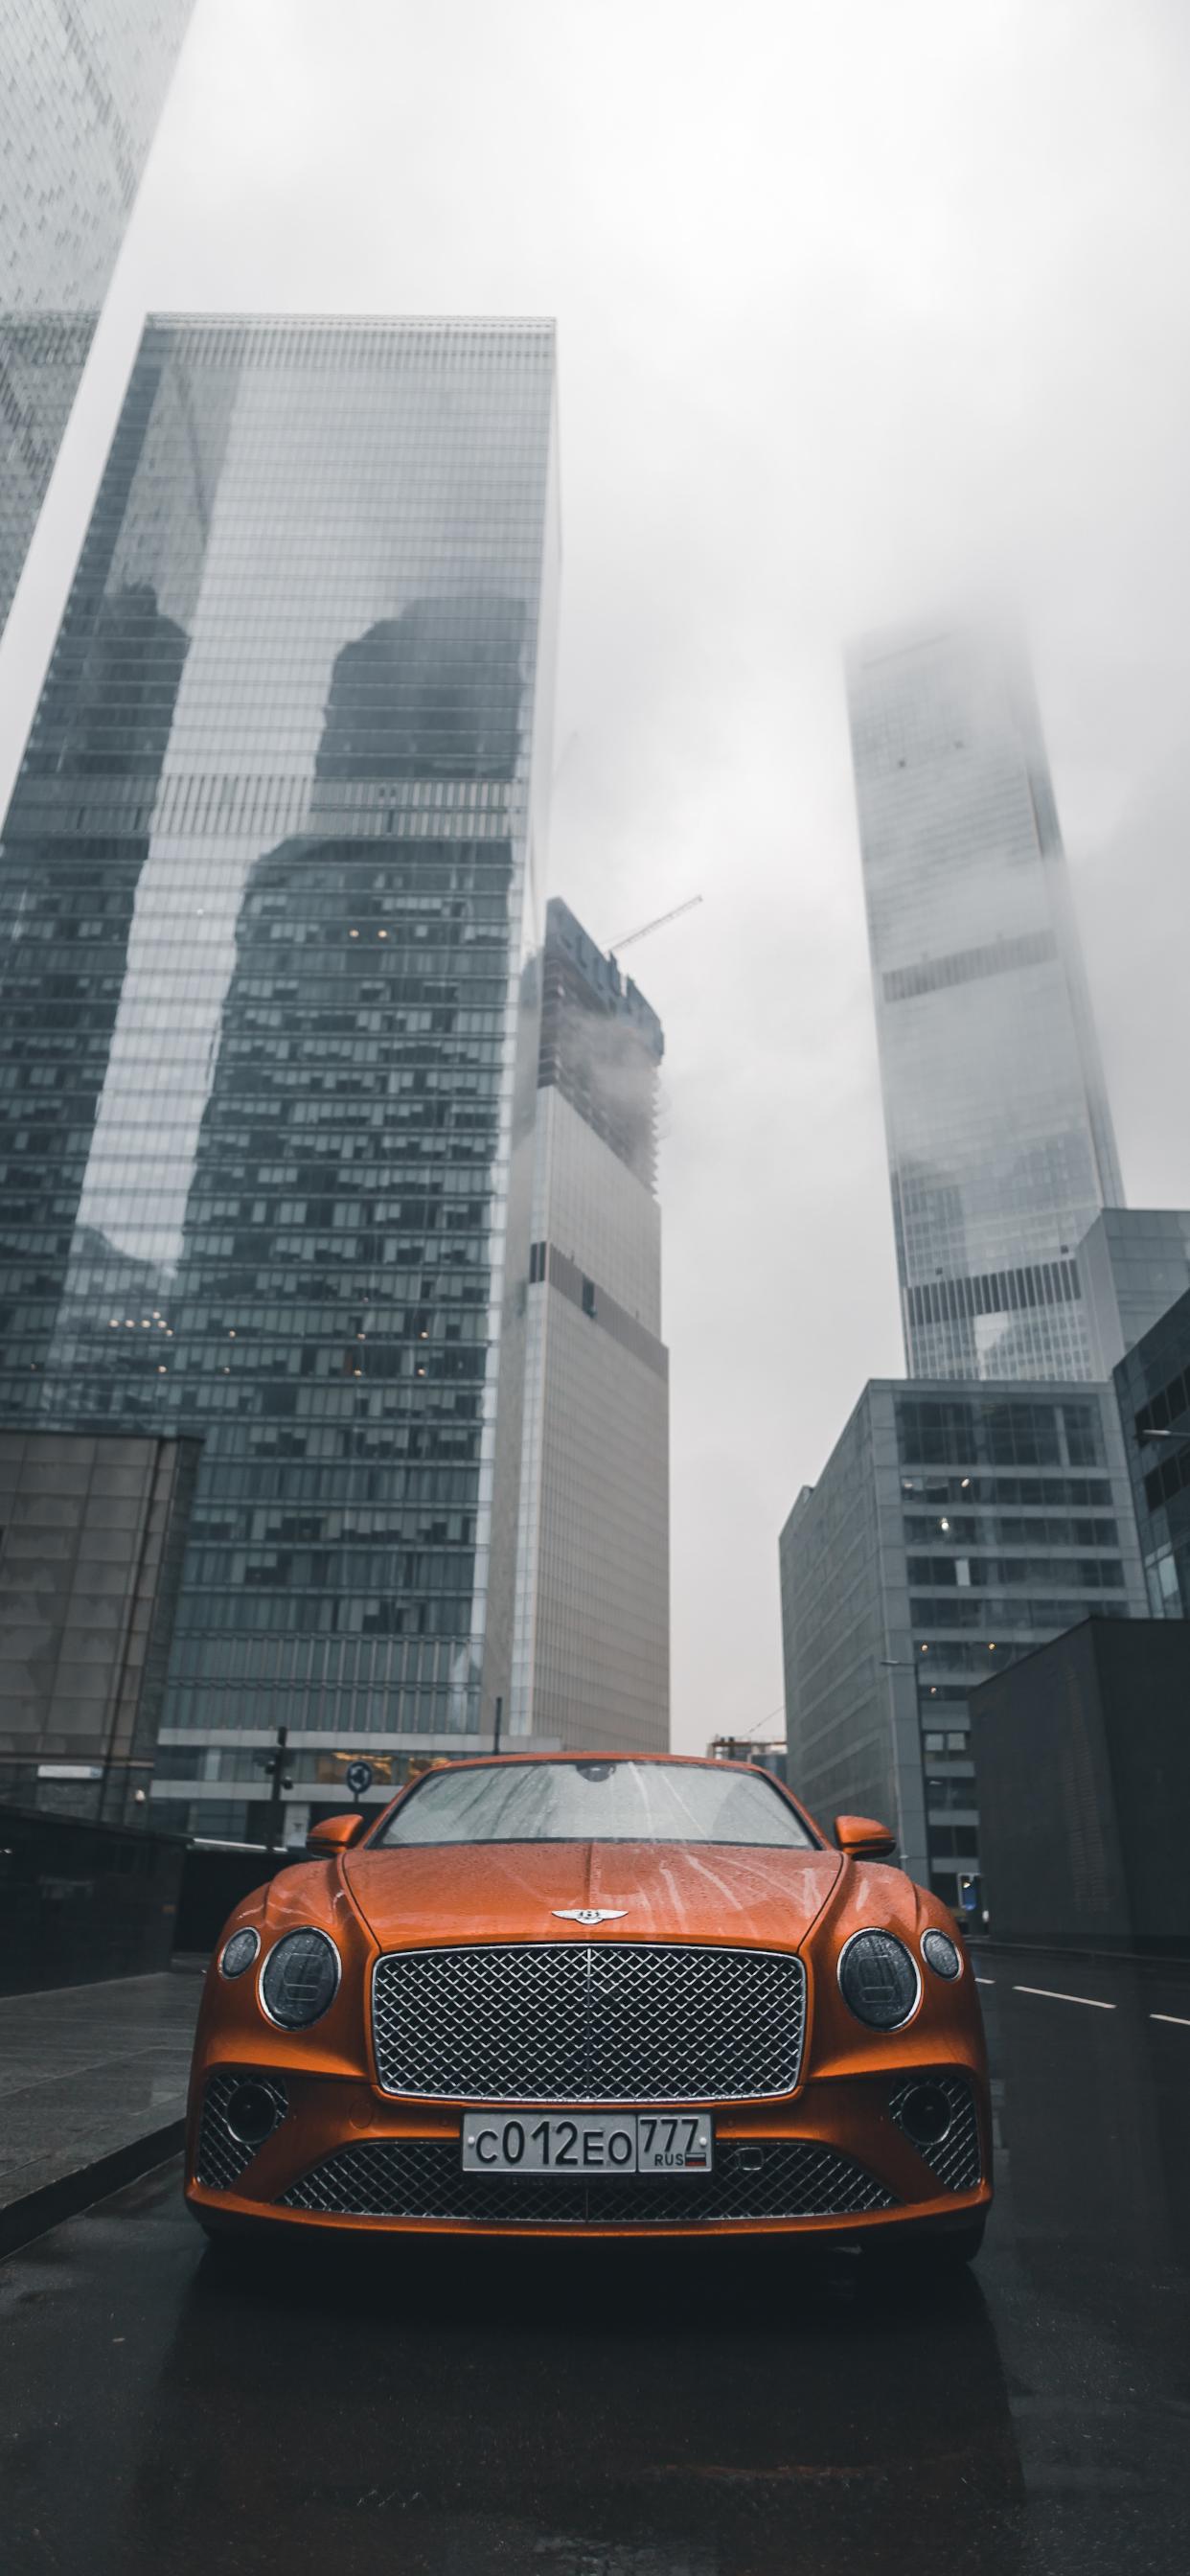 iPhone wallpaper bentley car street Fonds d'écran iPhone du 29/08/2019